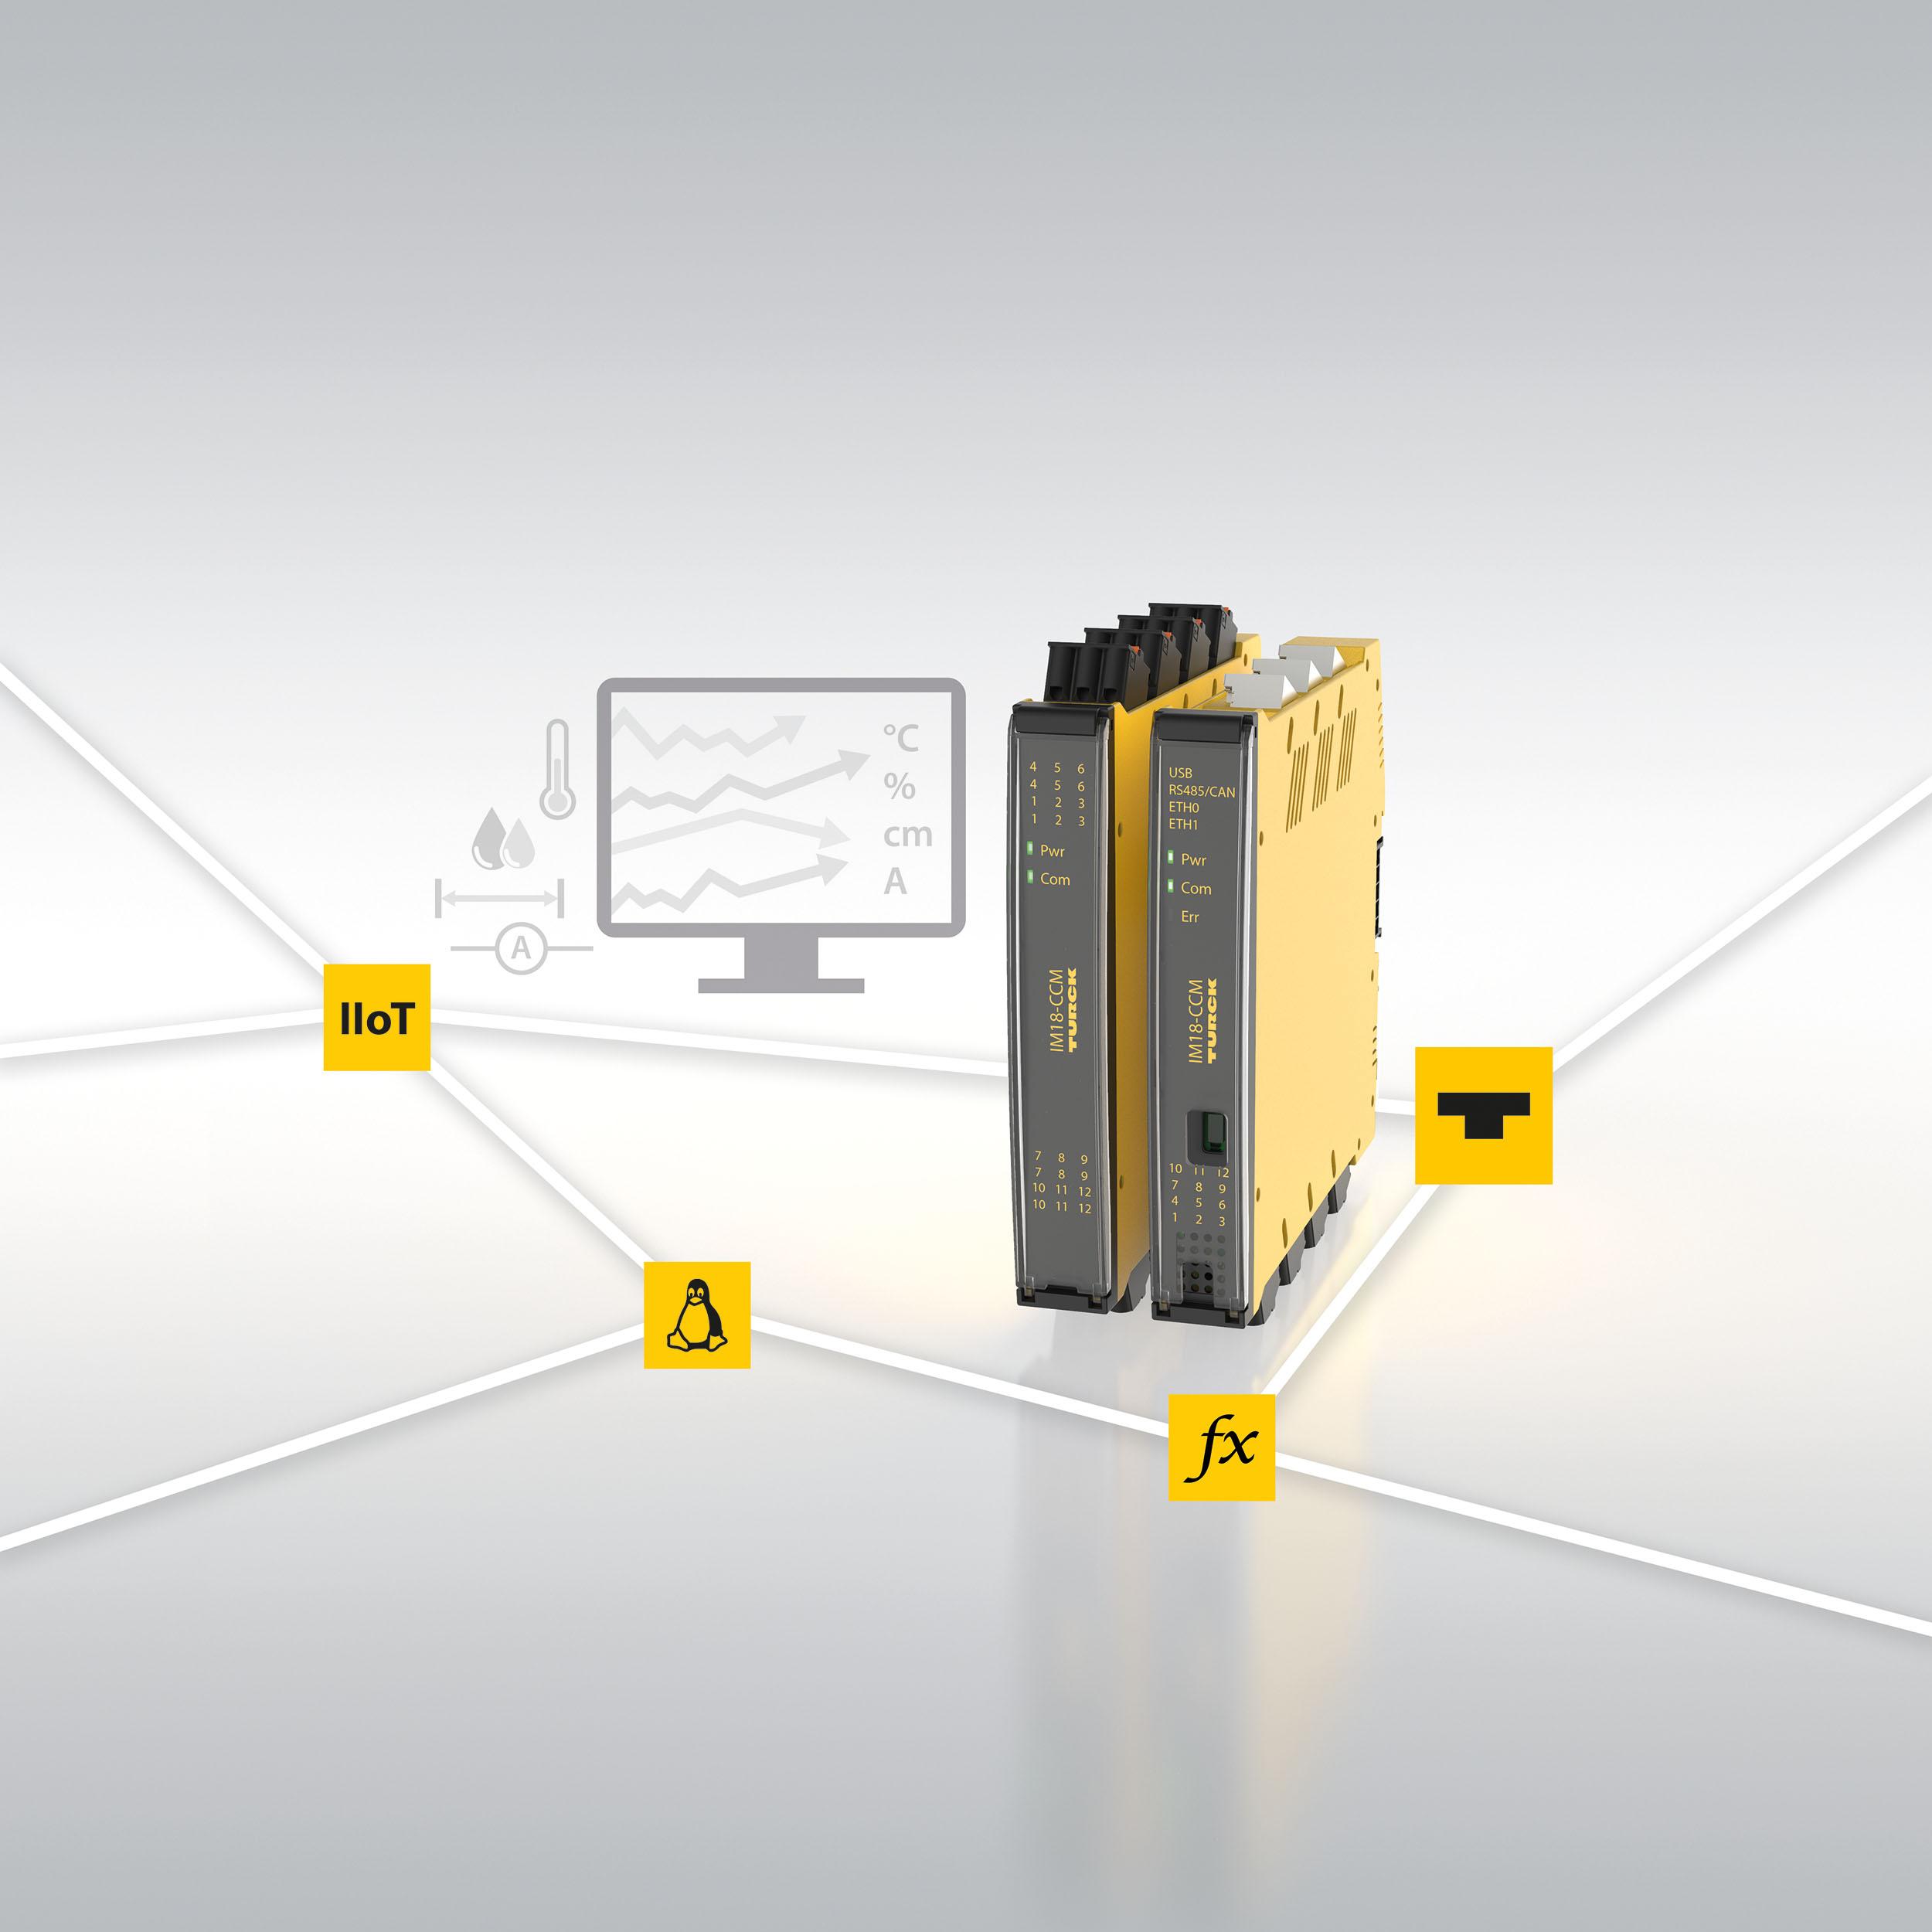 Linux-basierte Condition-Monitoring-Plattform